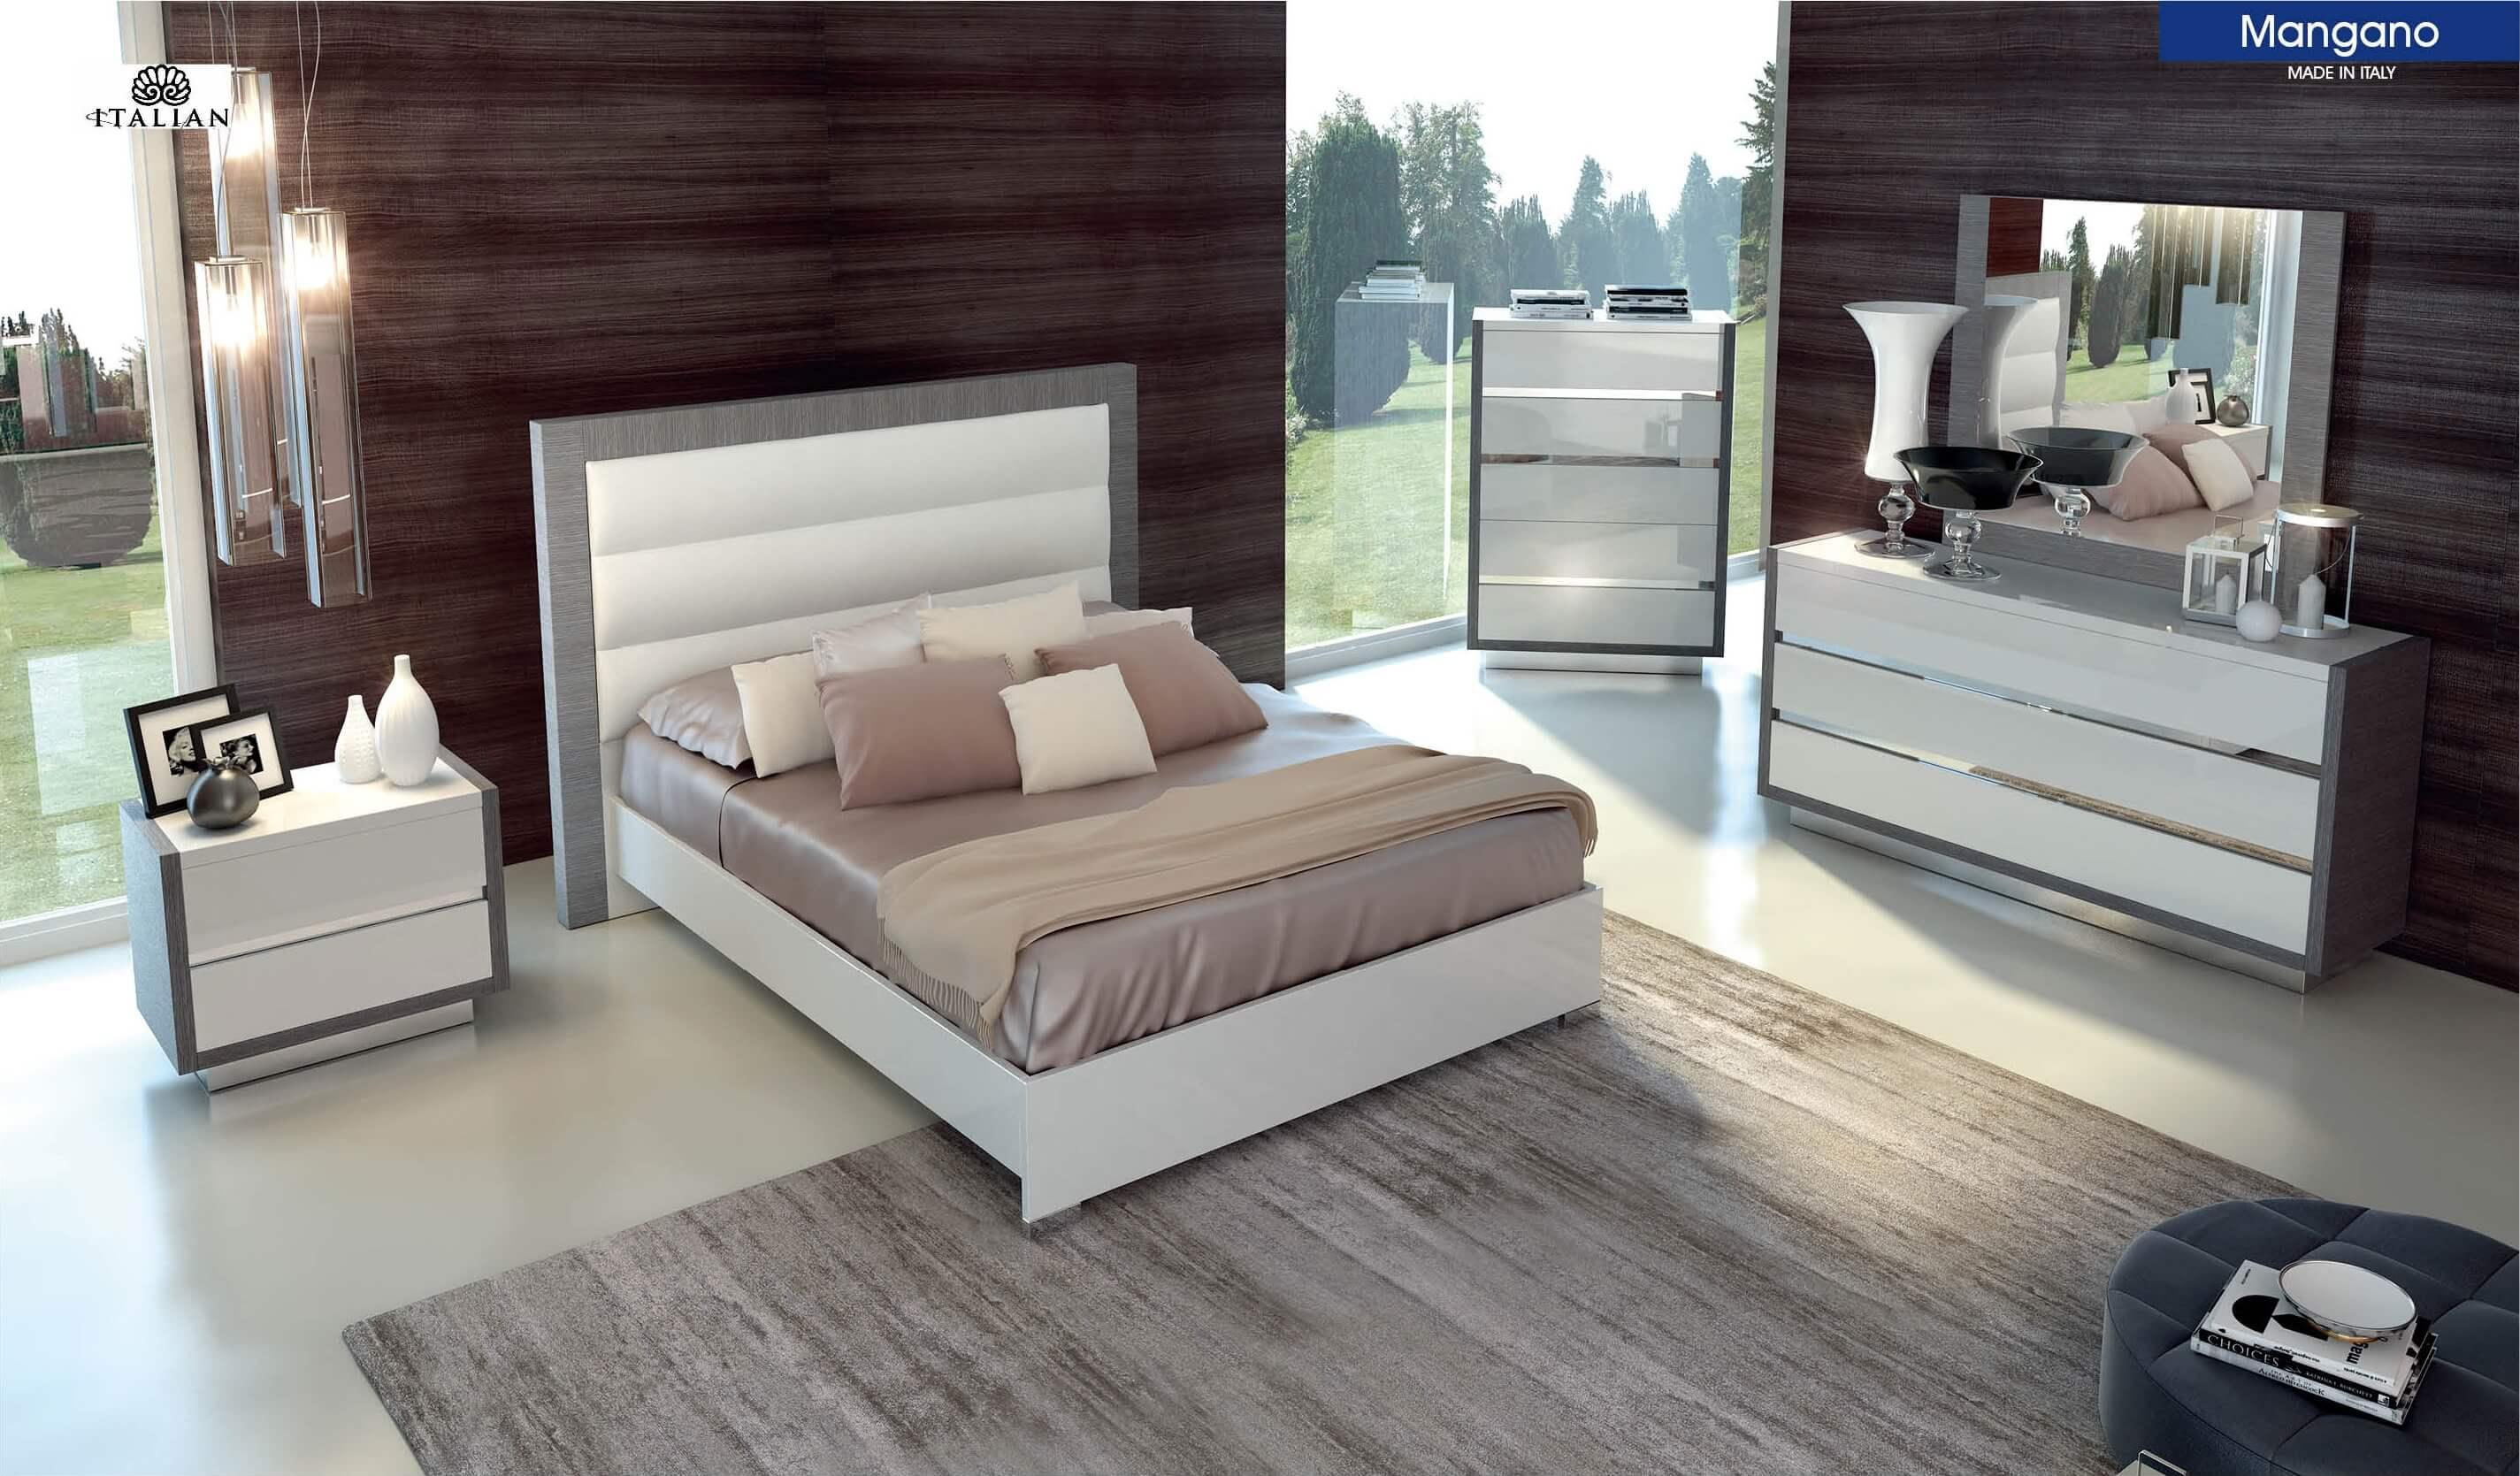 mangano bedroom set buy online at best price sohomod